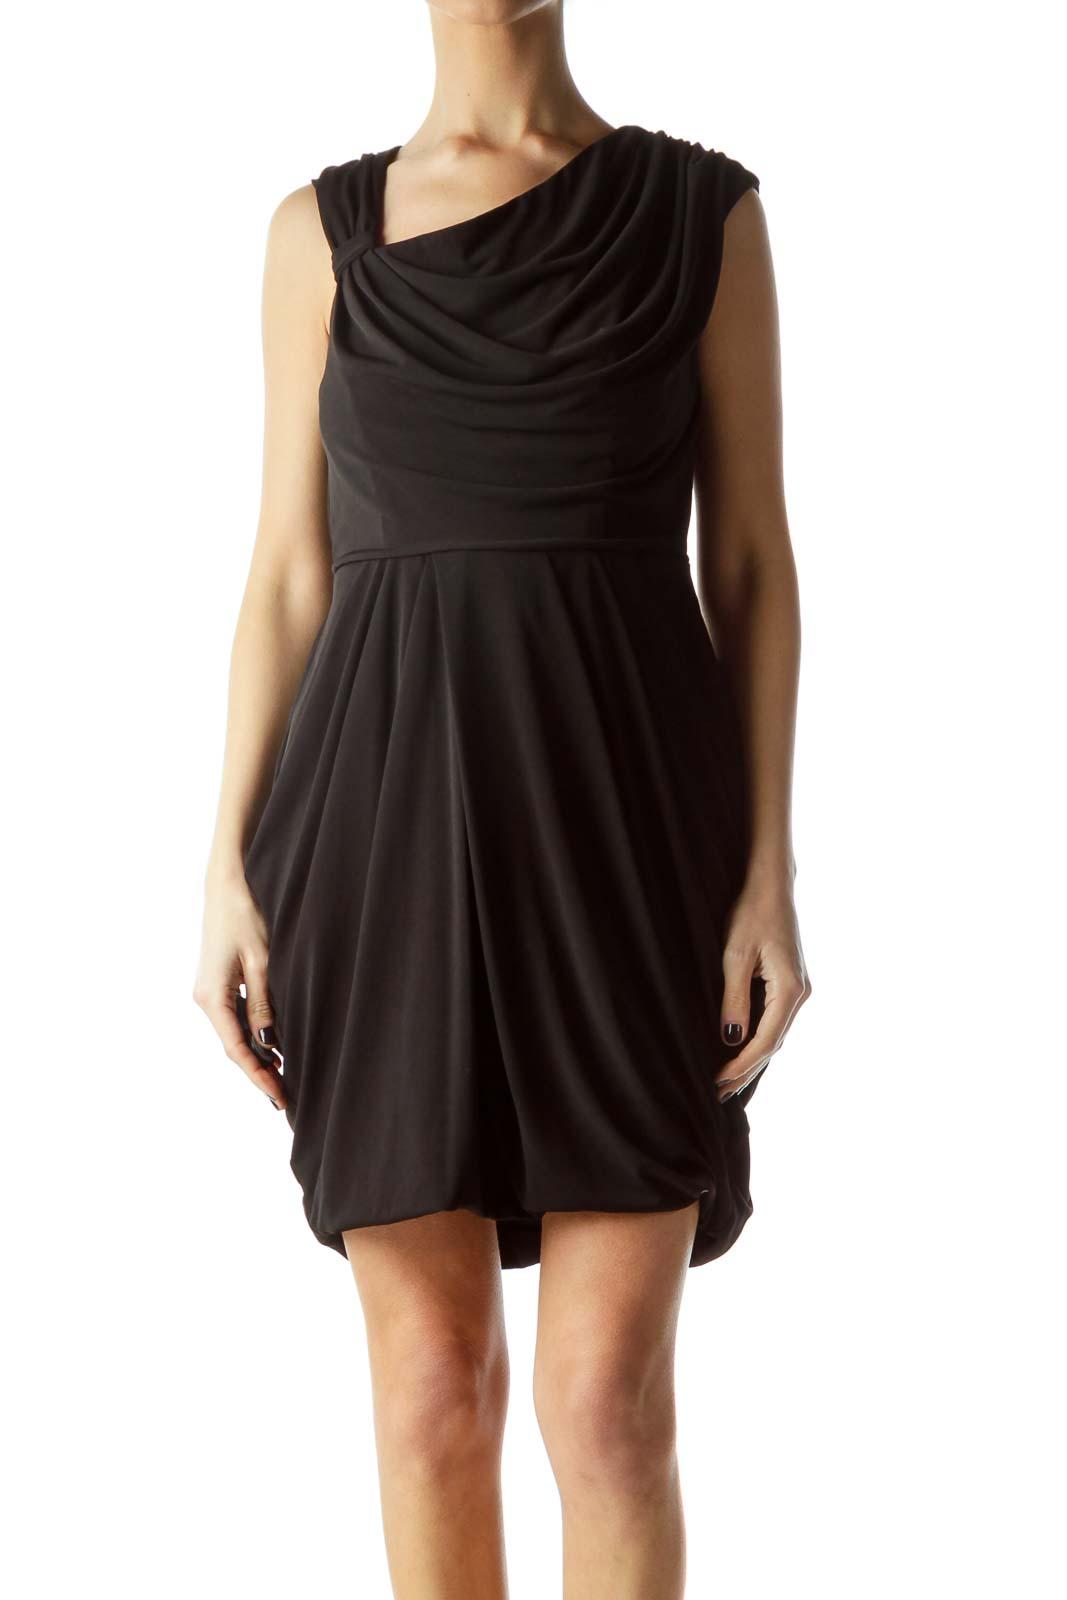 Black Elastic Stretch Cocktail Dress